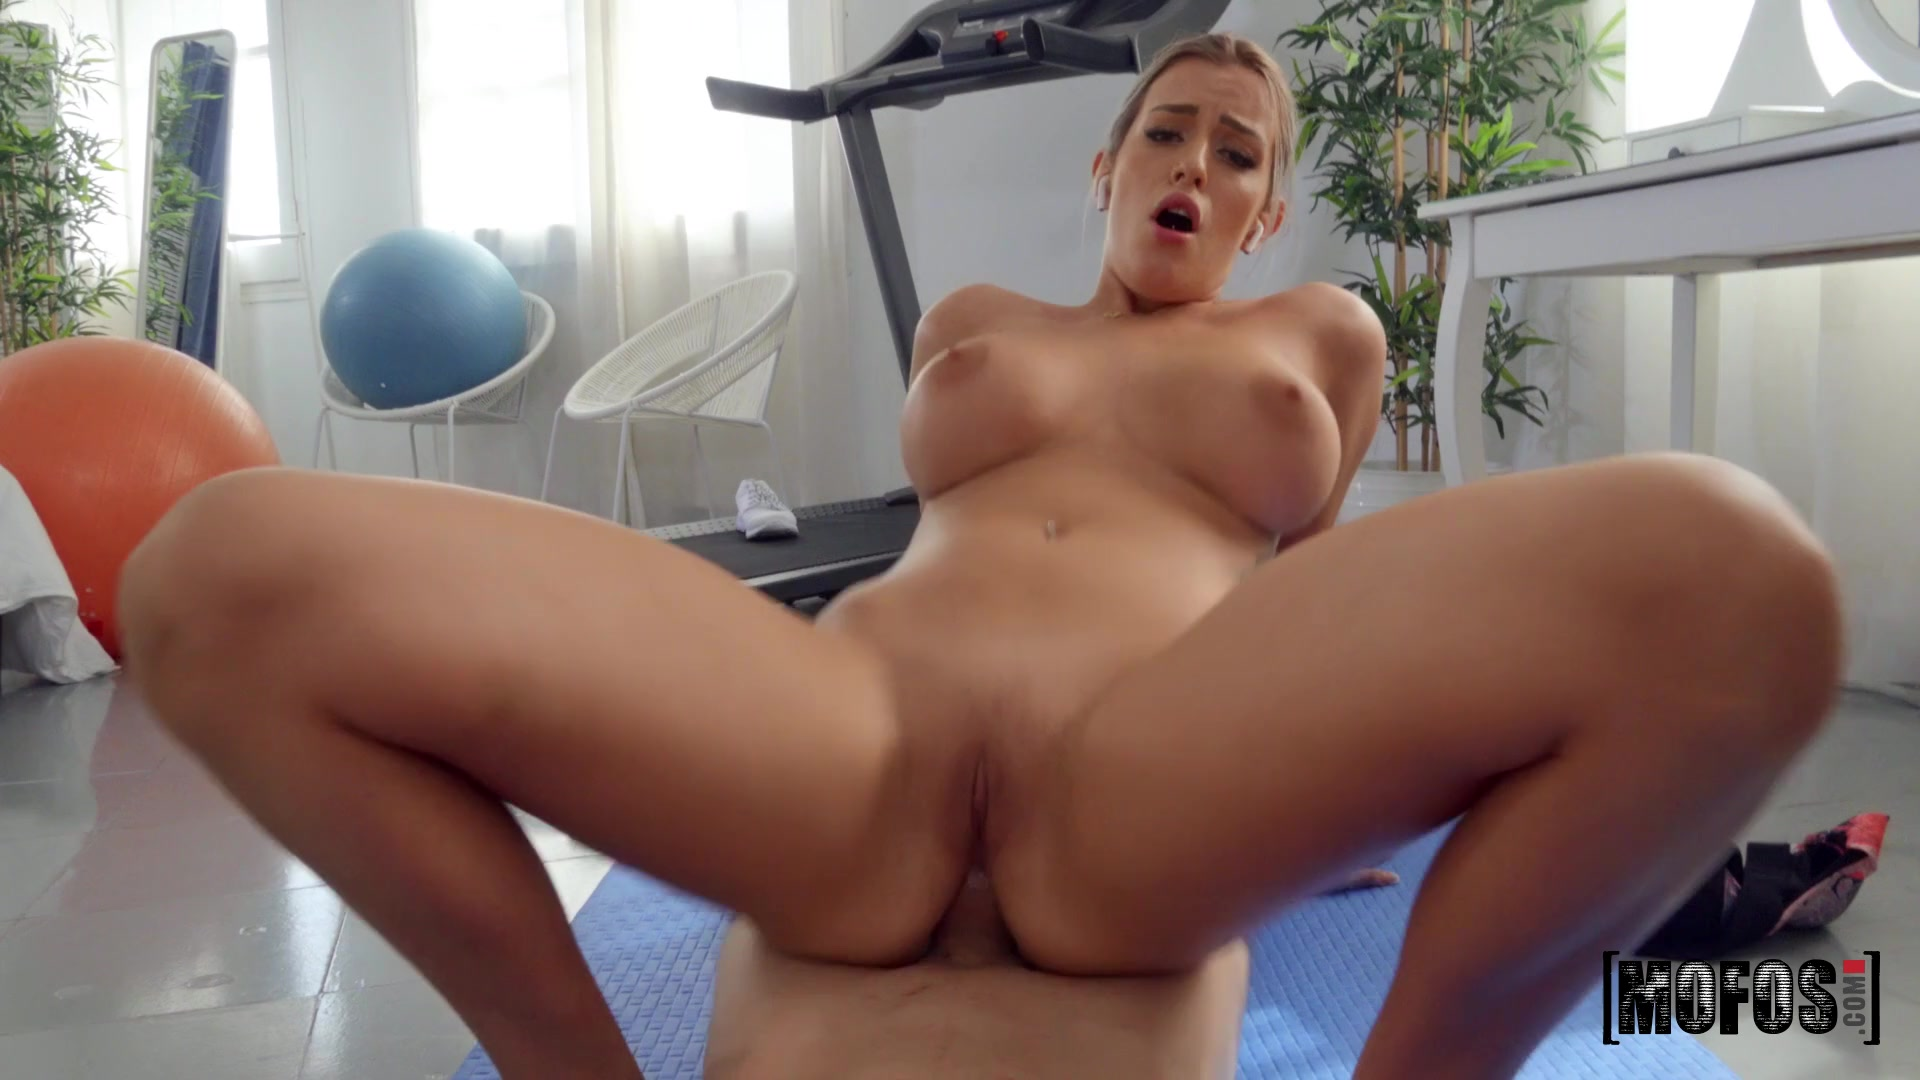 Pervs On Patrol - Merica's Workout 2 - Big Tits